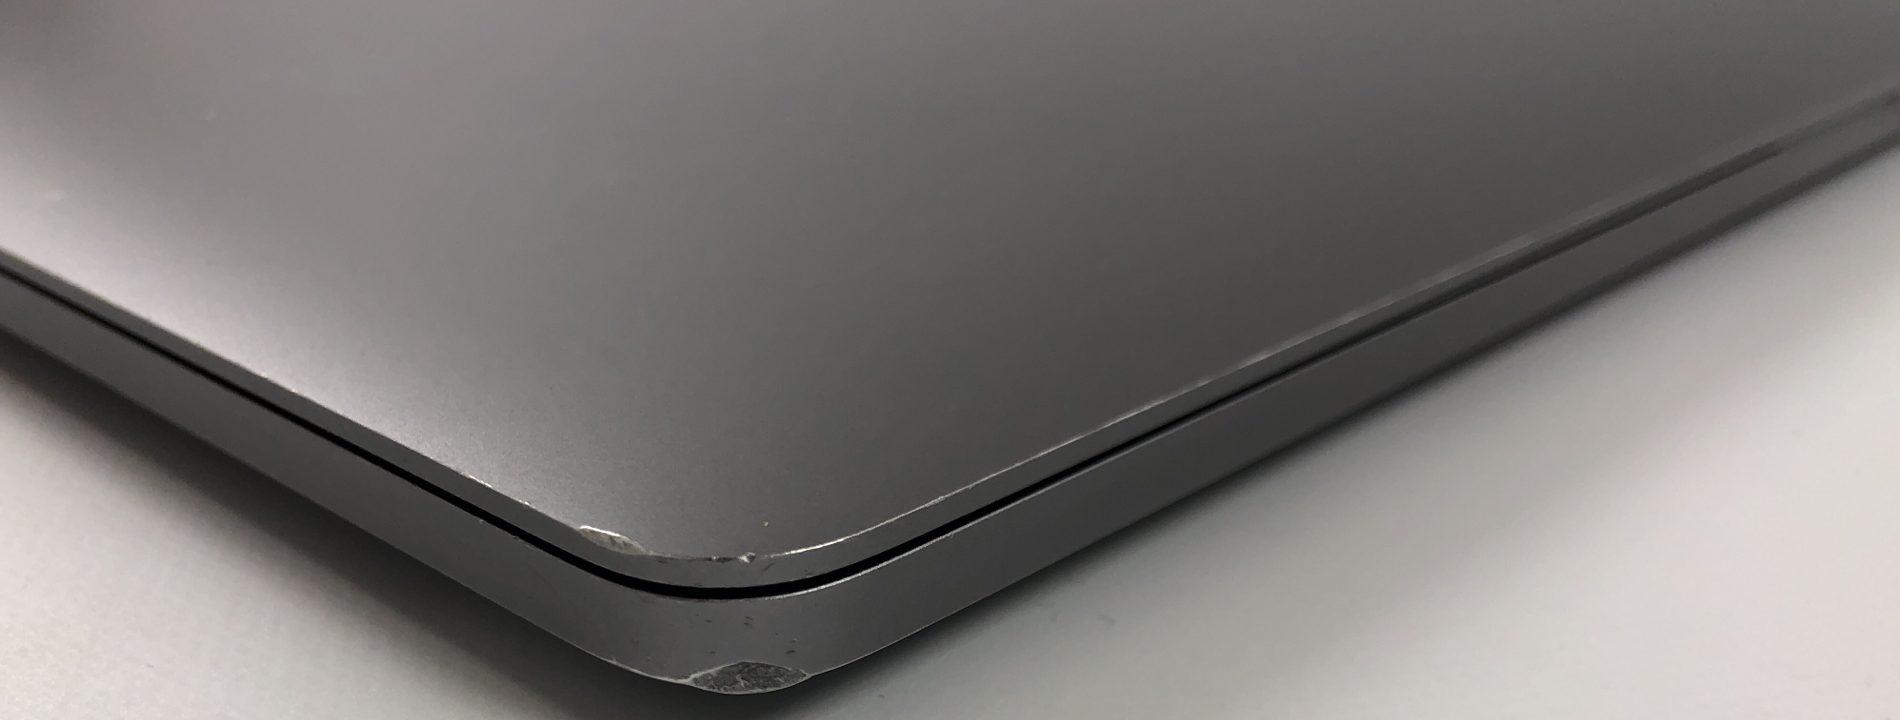 "MacBook Pro 15"" Touch Bar Late 2016 (Intel Quad-Core i7 2.9 GHz 16 GB RAM 512 GB SSD), Space Gray, Intel Quad-Core i7 2.9 GHz, 16 GB RAM, 512 GB SSD, imagen 3"